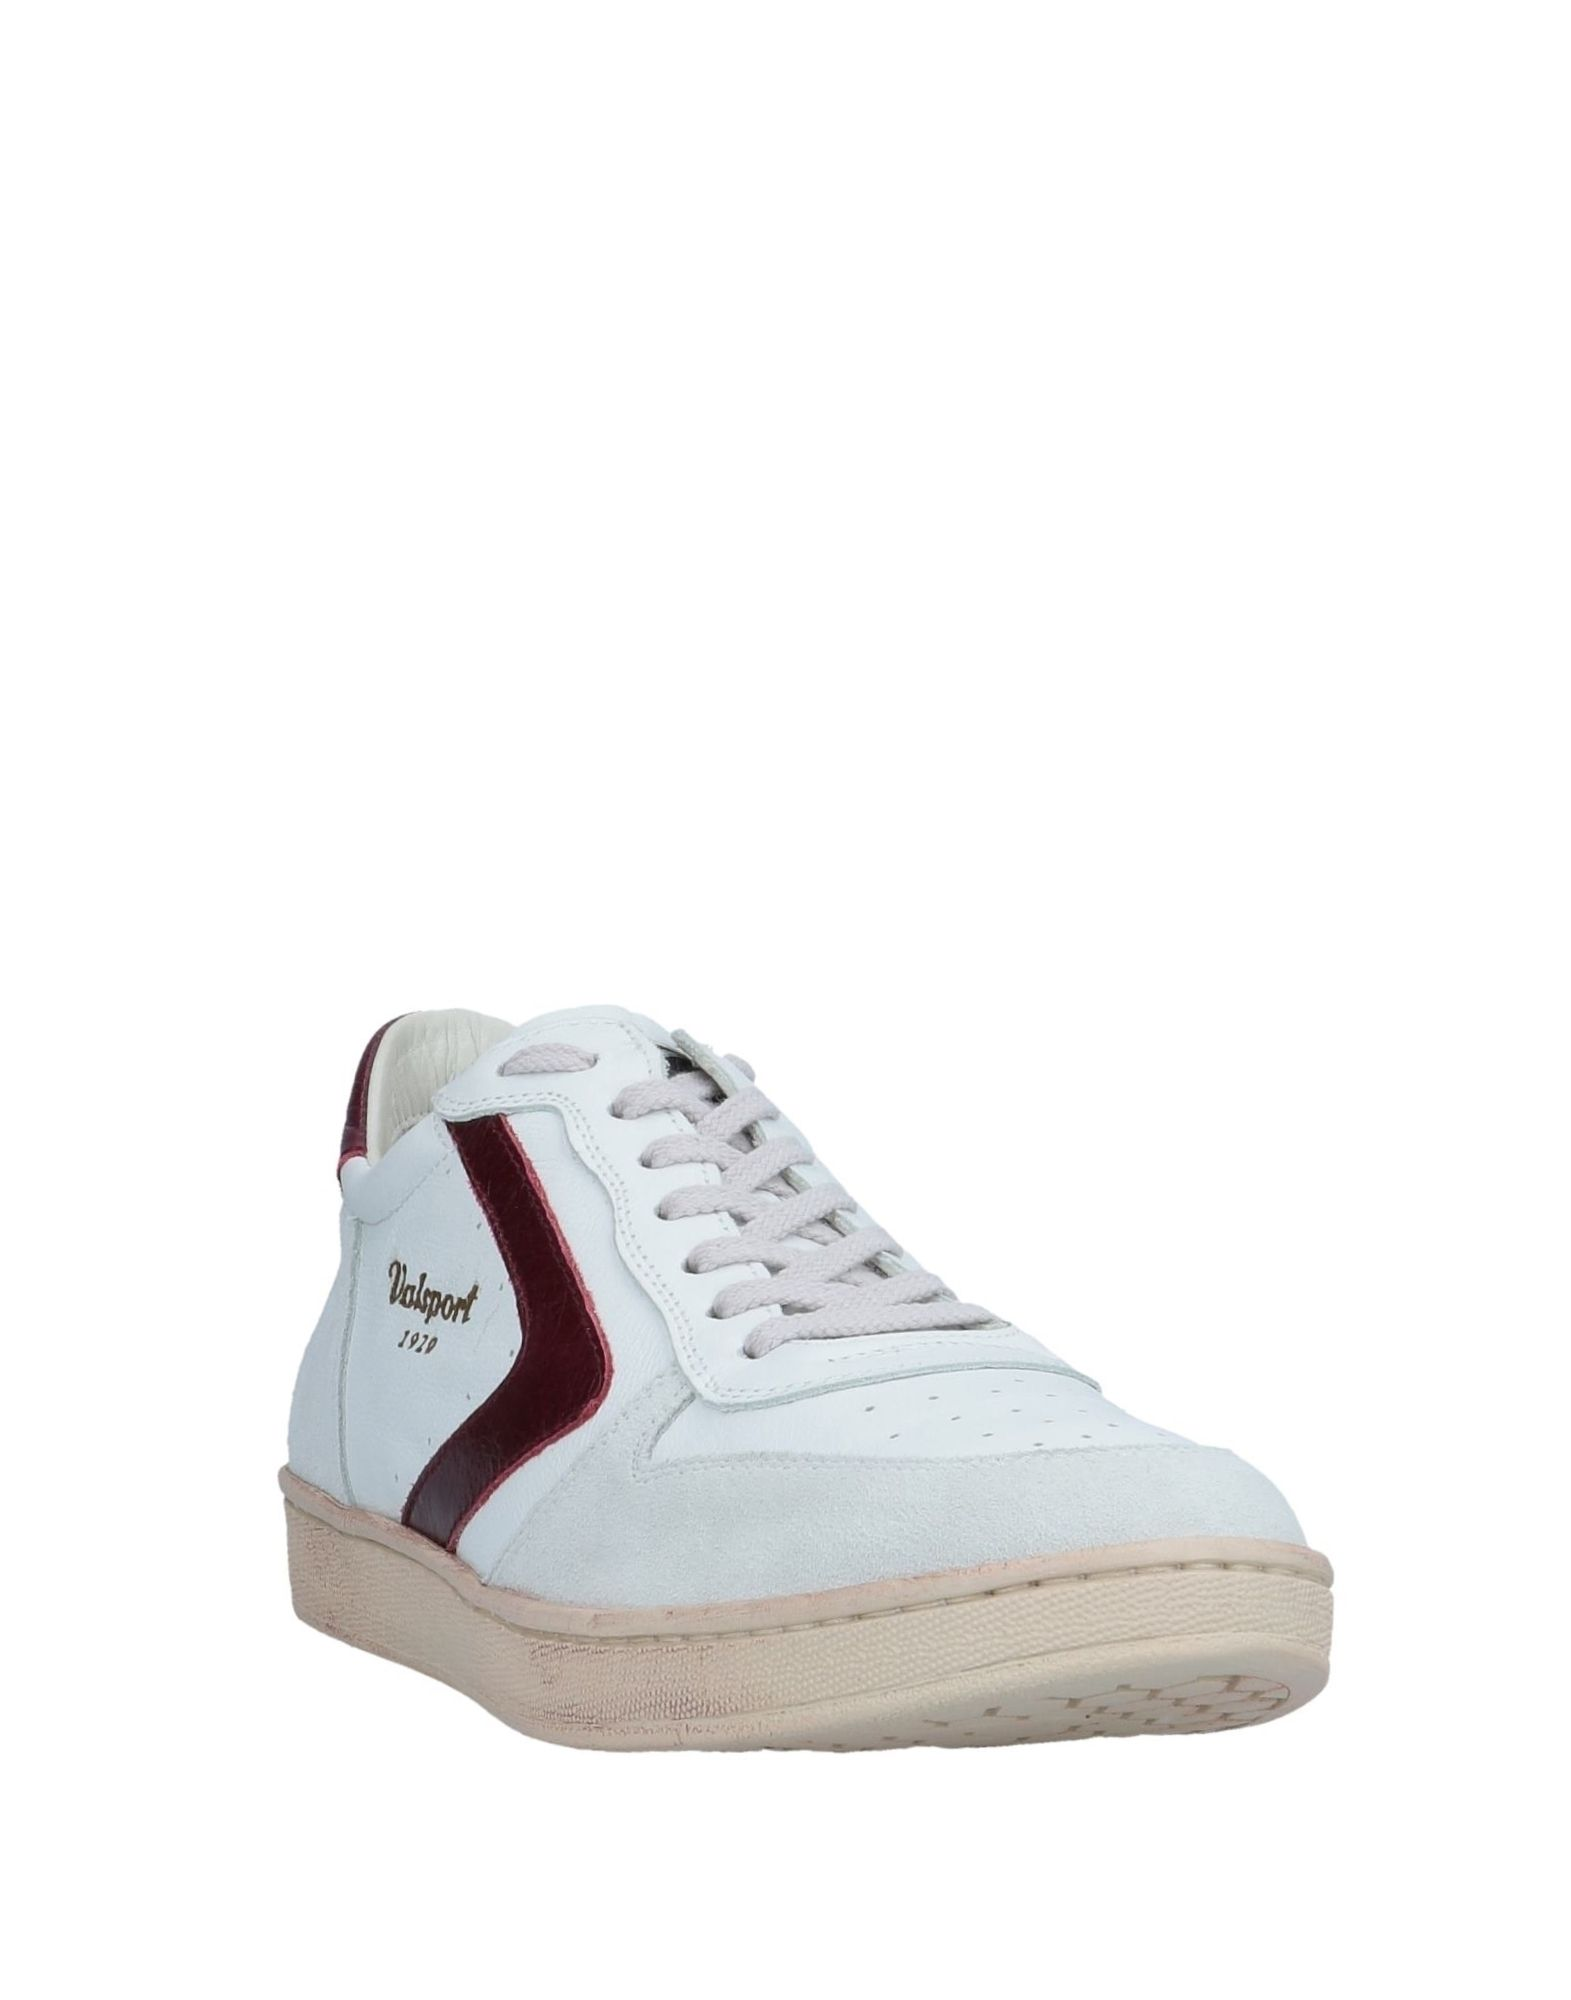 Valsport Sneakers - Canada Men Valsport Sneakers online on  Canada - - 11549853IS 882e26